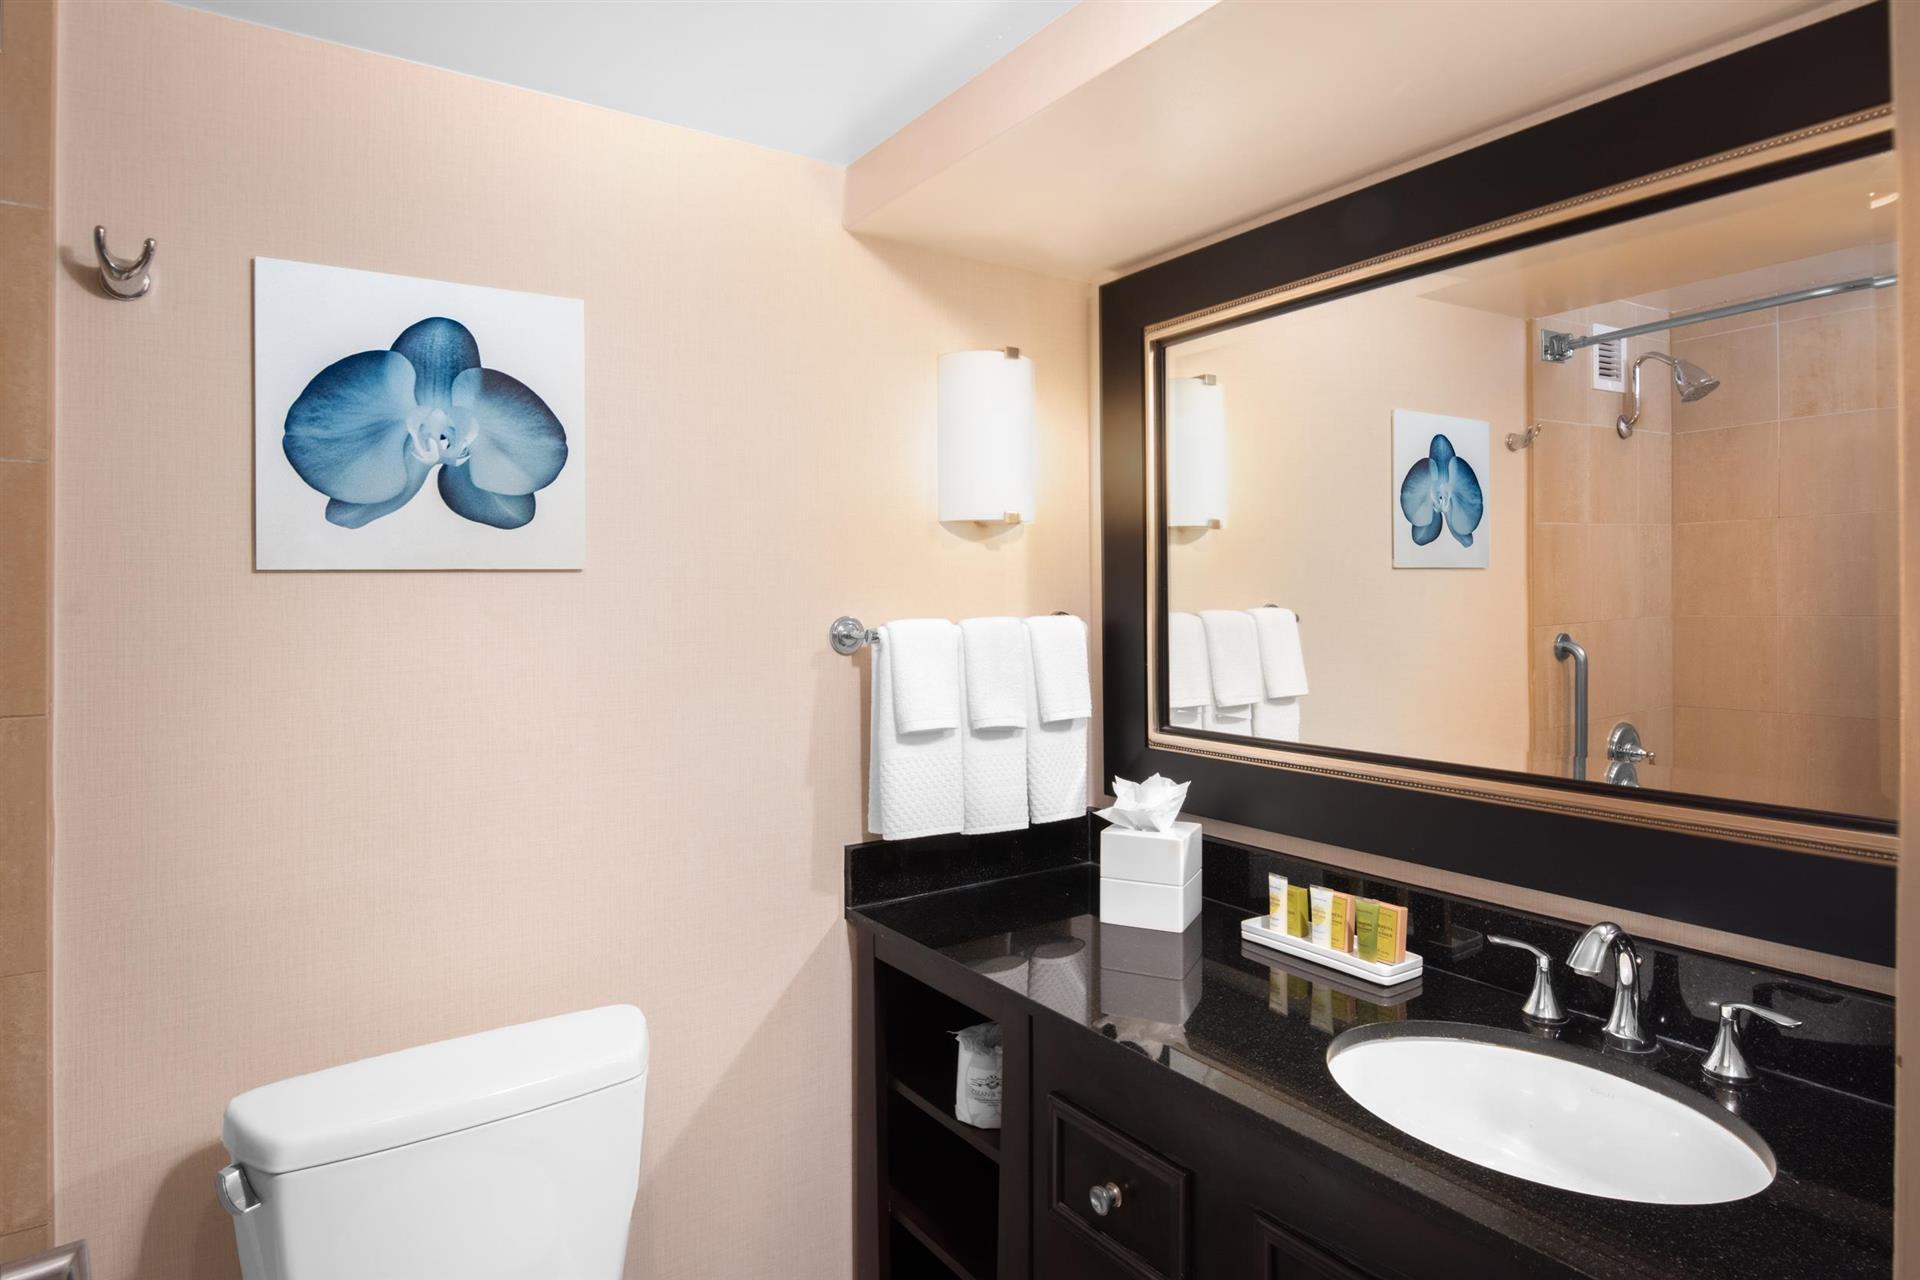 olive green bathroom decor ideas for your luxury bathroom.htm meetings and events at hilton san diego airport harbor island  san  hilton san diego airport harbor island